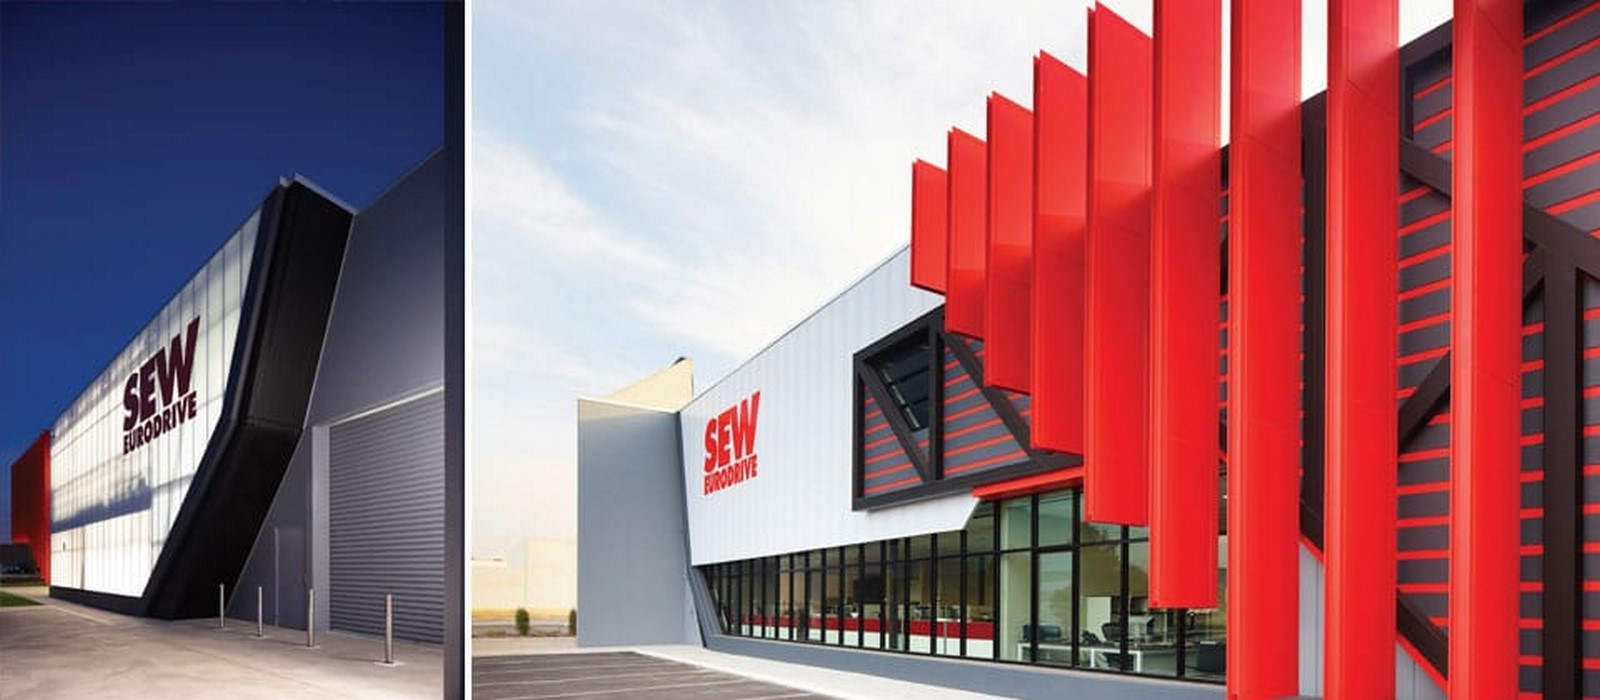 SEW Eurodrive Office and Warehouse, Welshpool, Western Australia - Sheet2